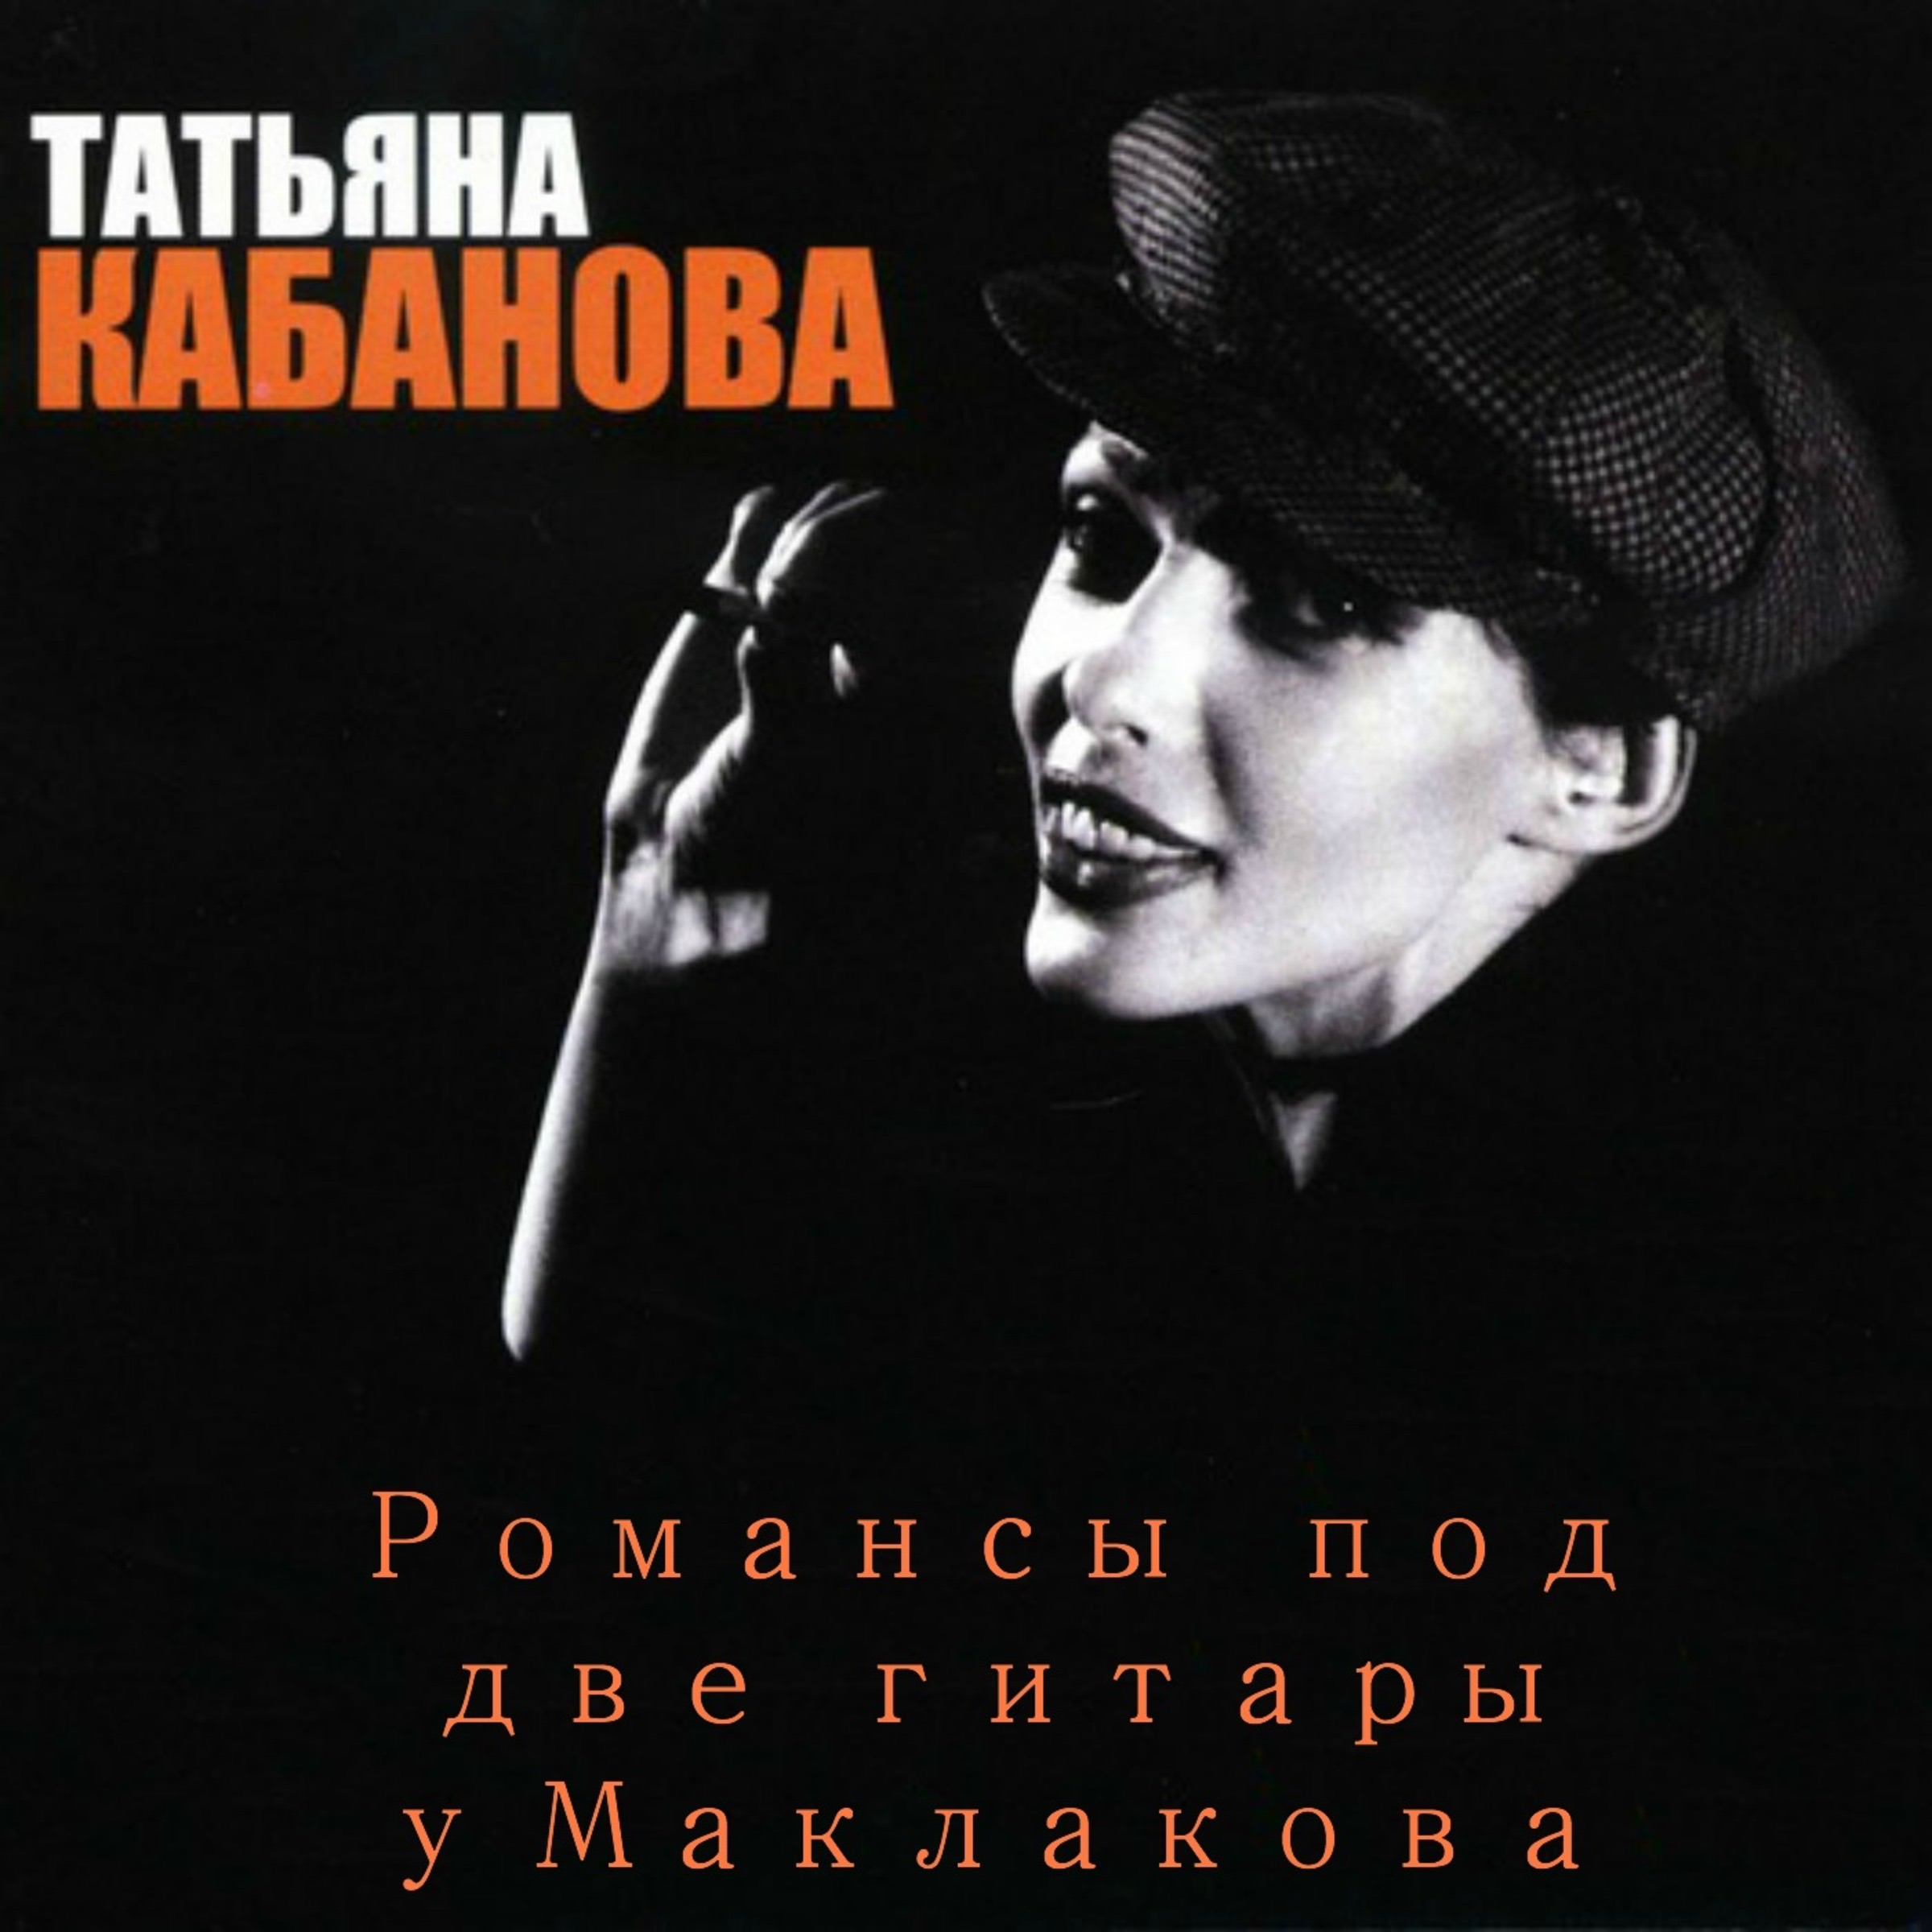 Татьяна 3 1998 14 фотография